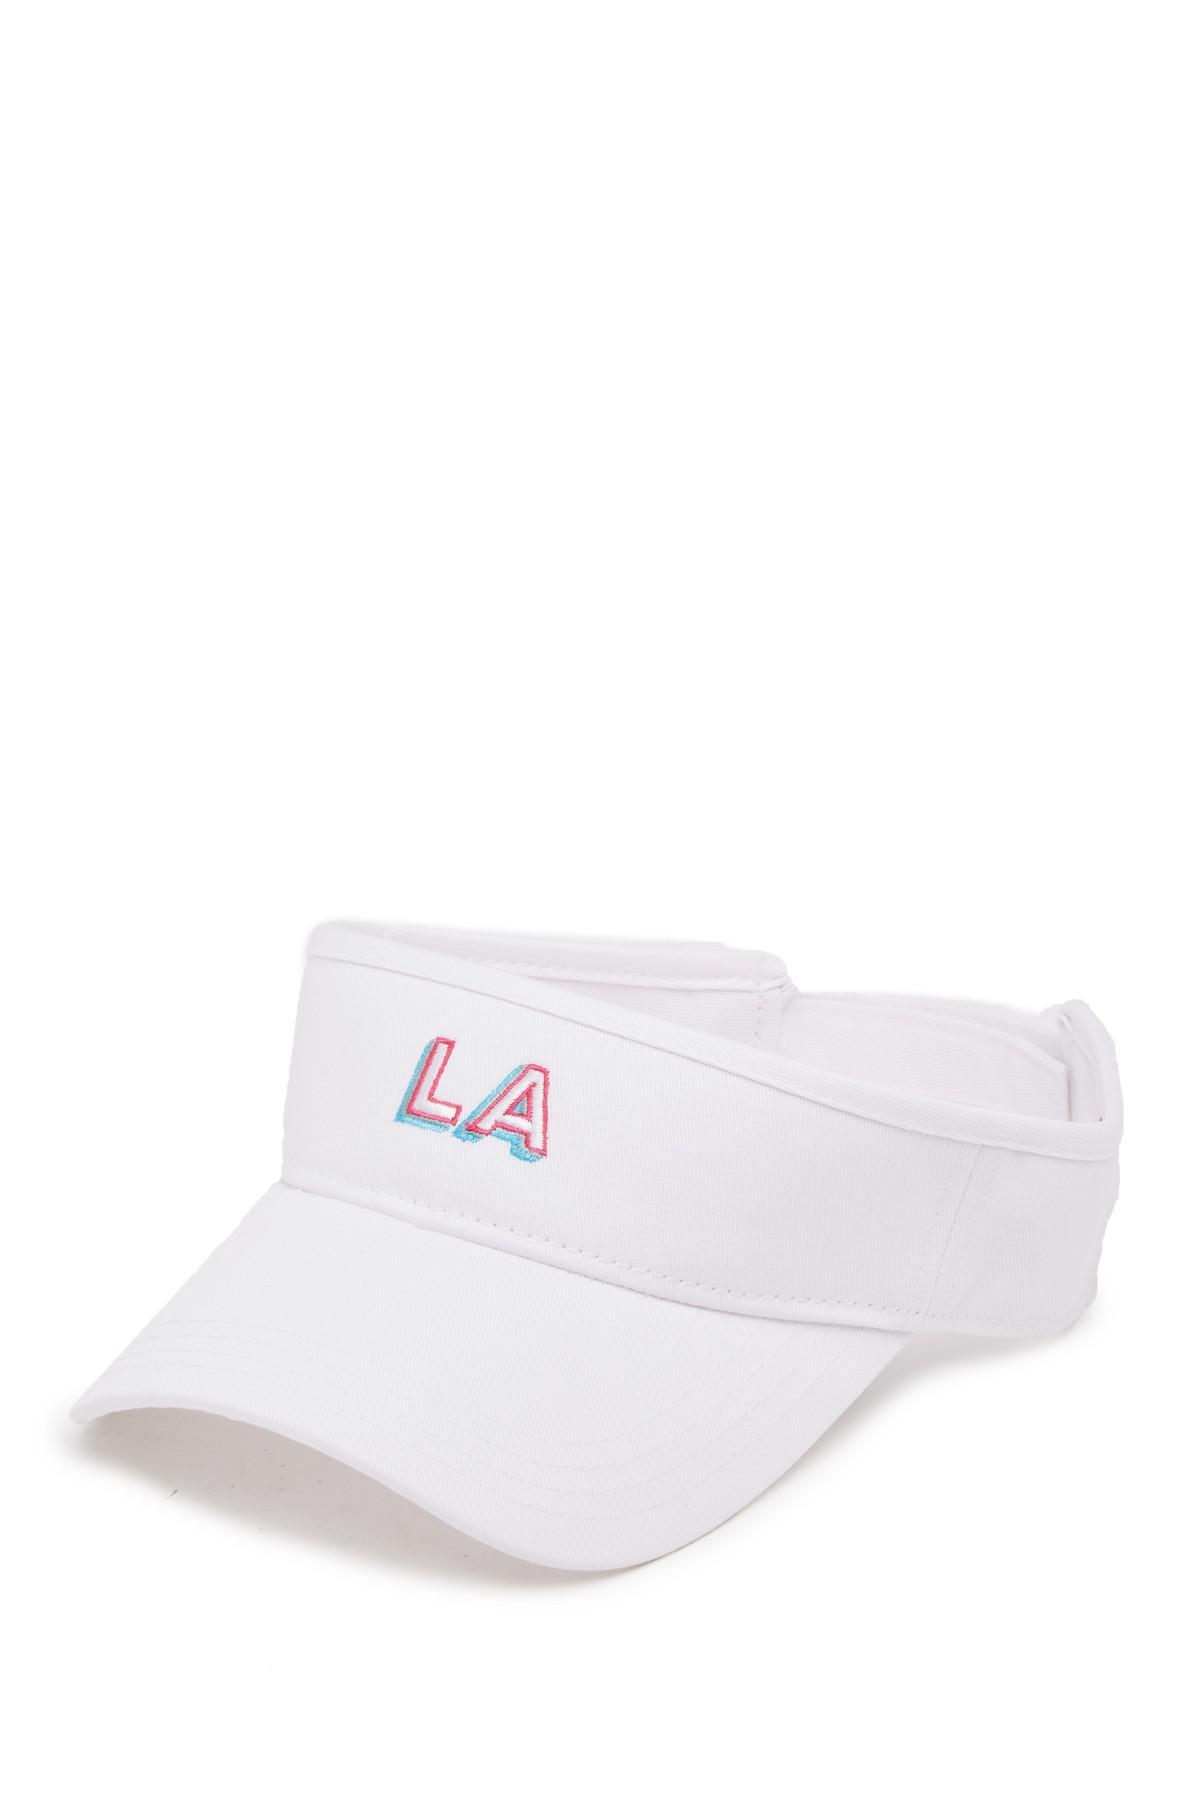 56717634233bd Lyst - American Needle Los Angeles Micro Visor in White for Men